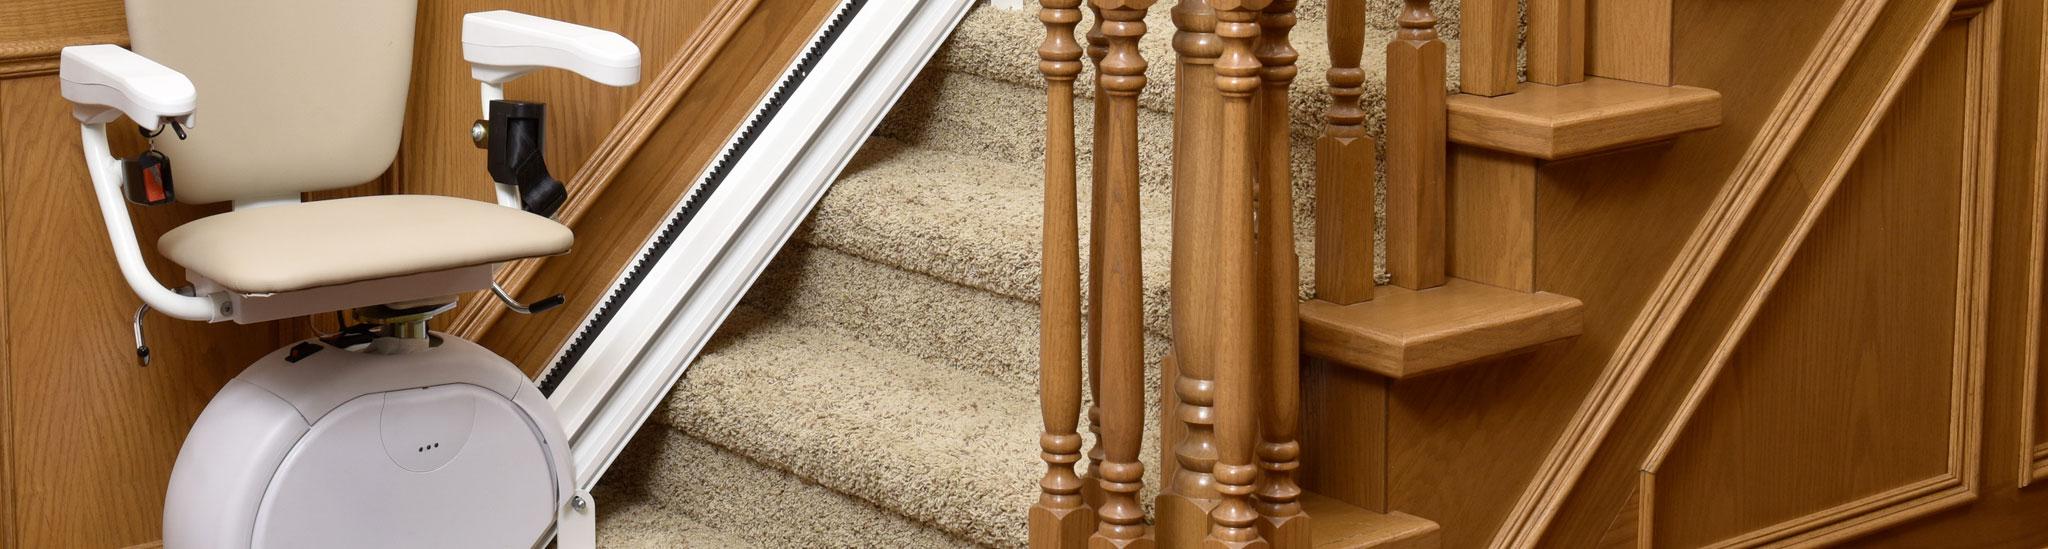 monte escalier acorn 80